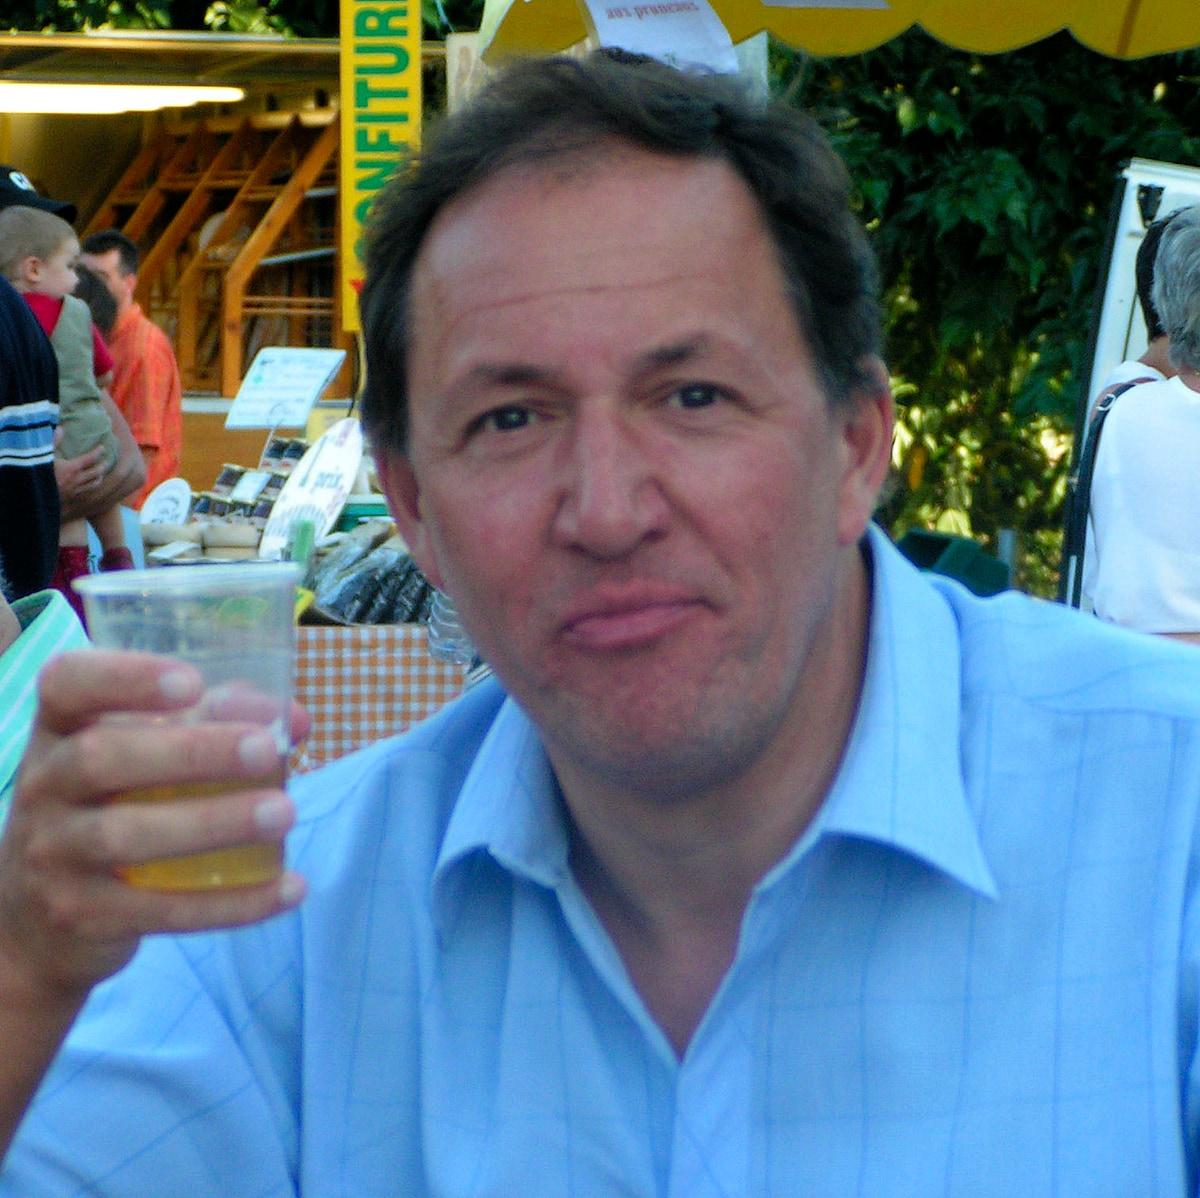 Gary From Estepona, Spain